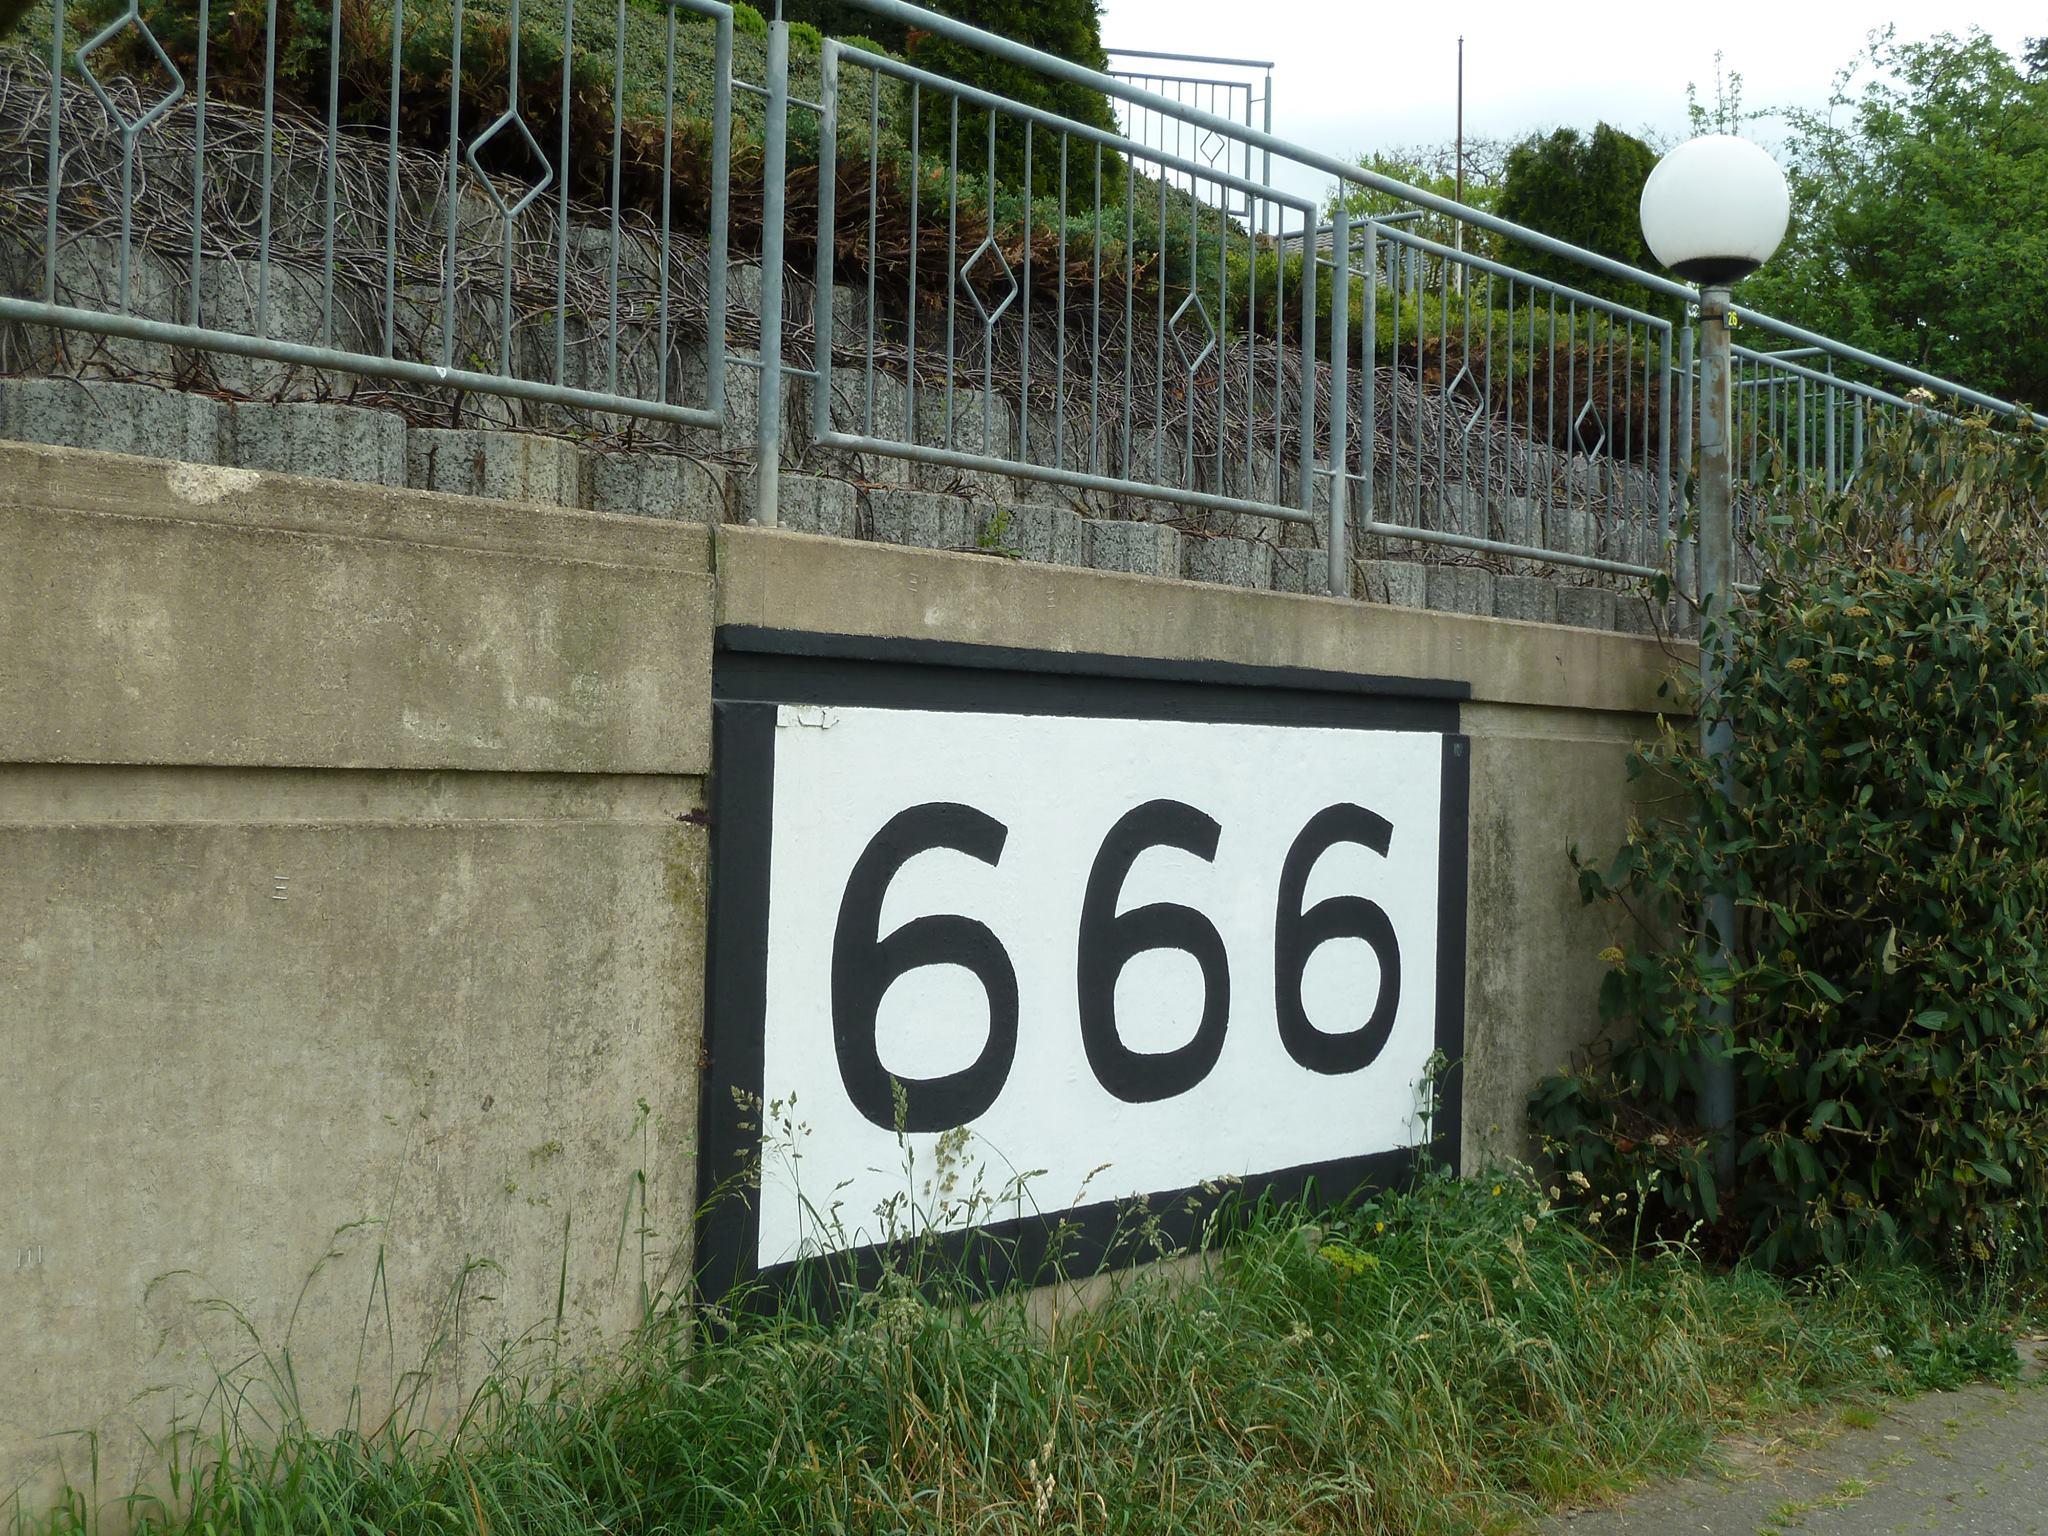 rheinkilometer-666-2